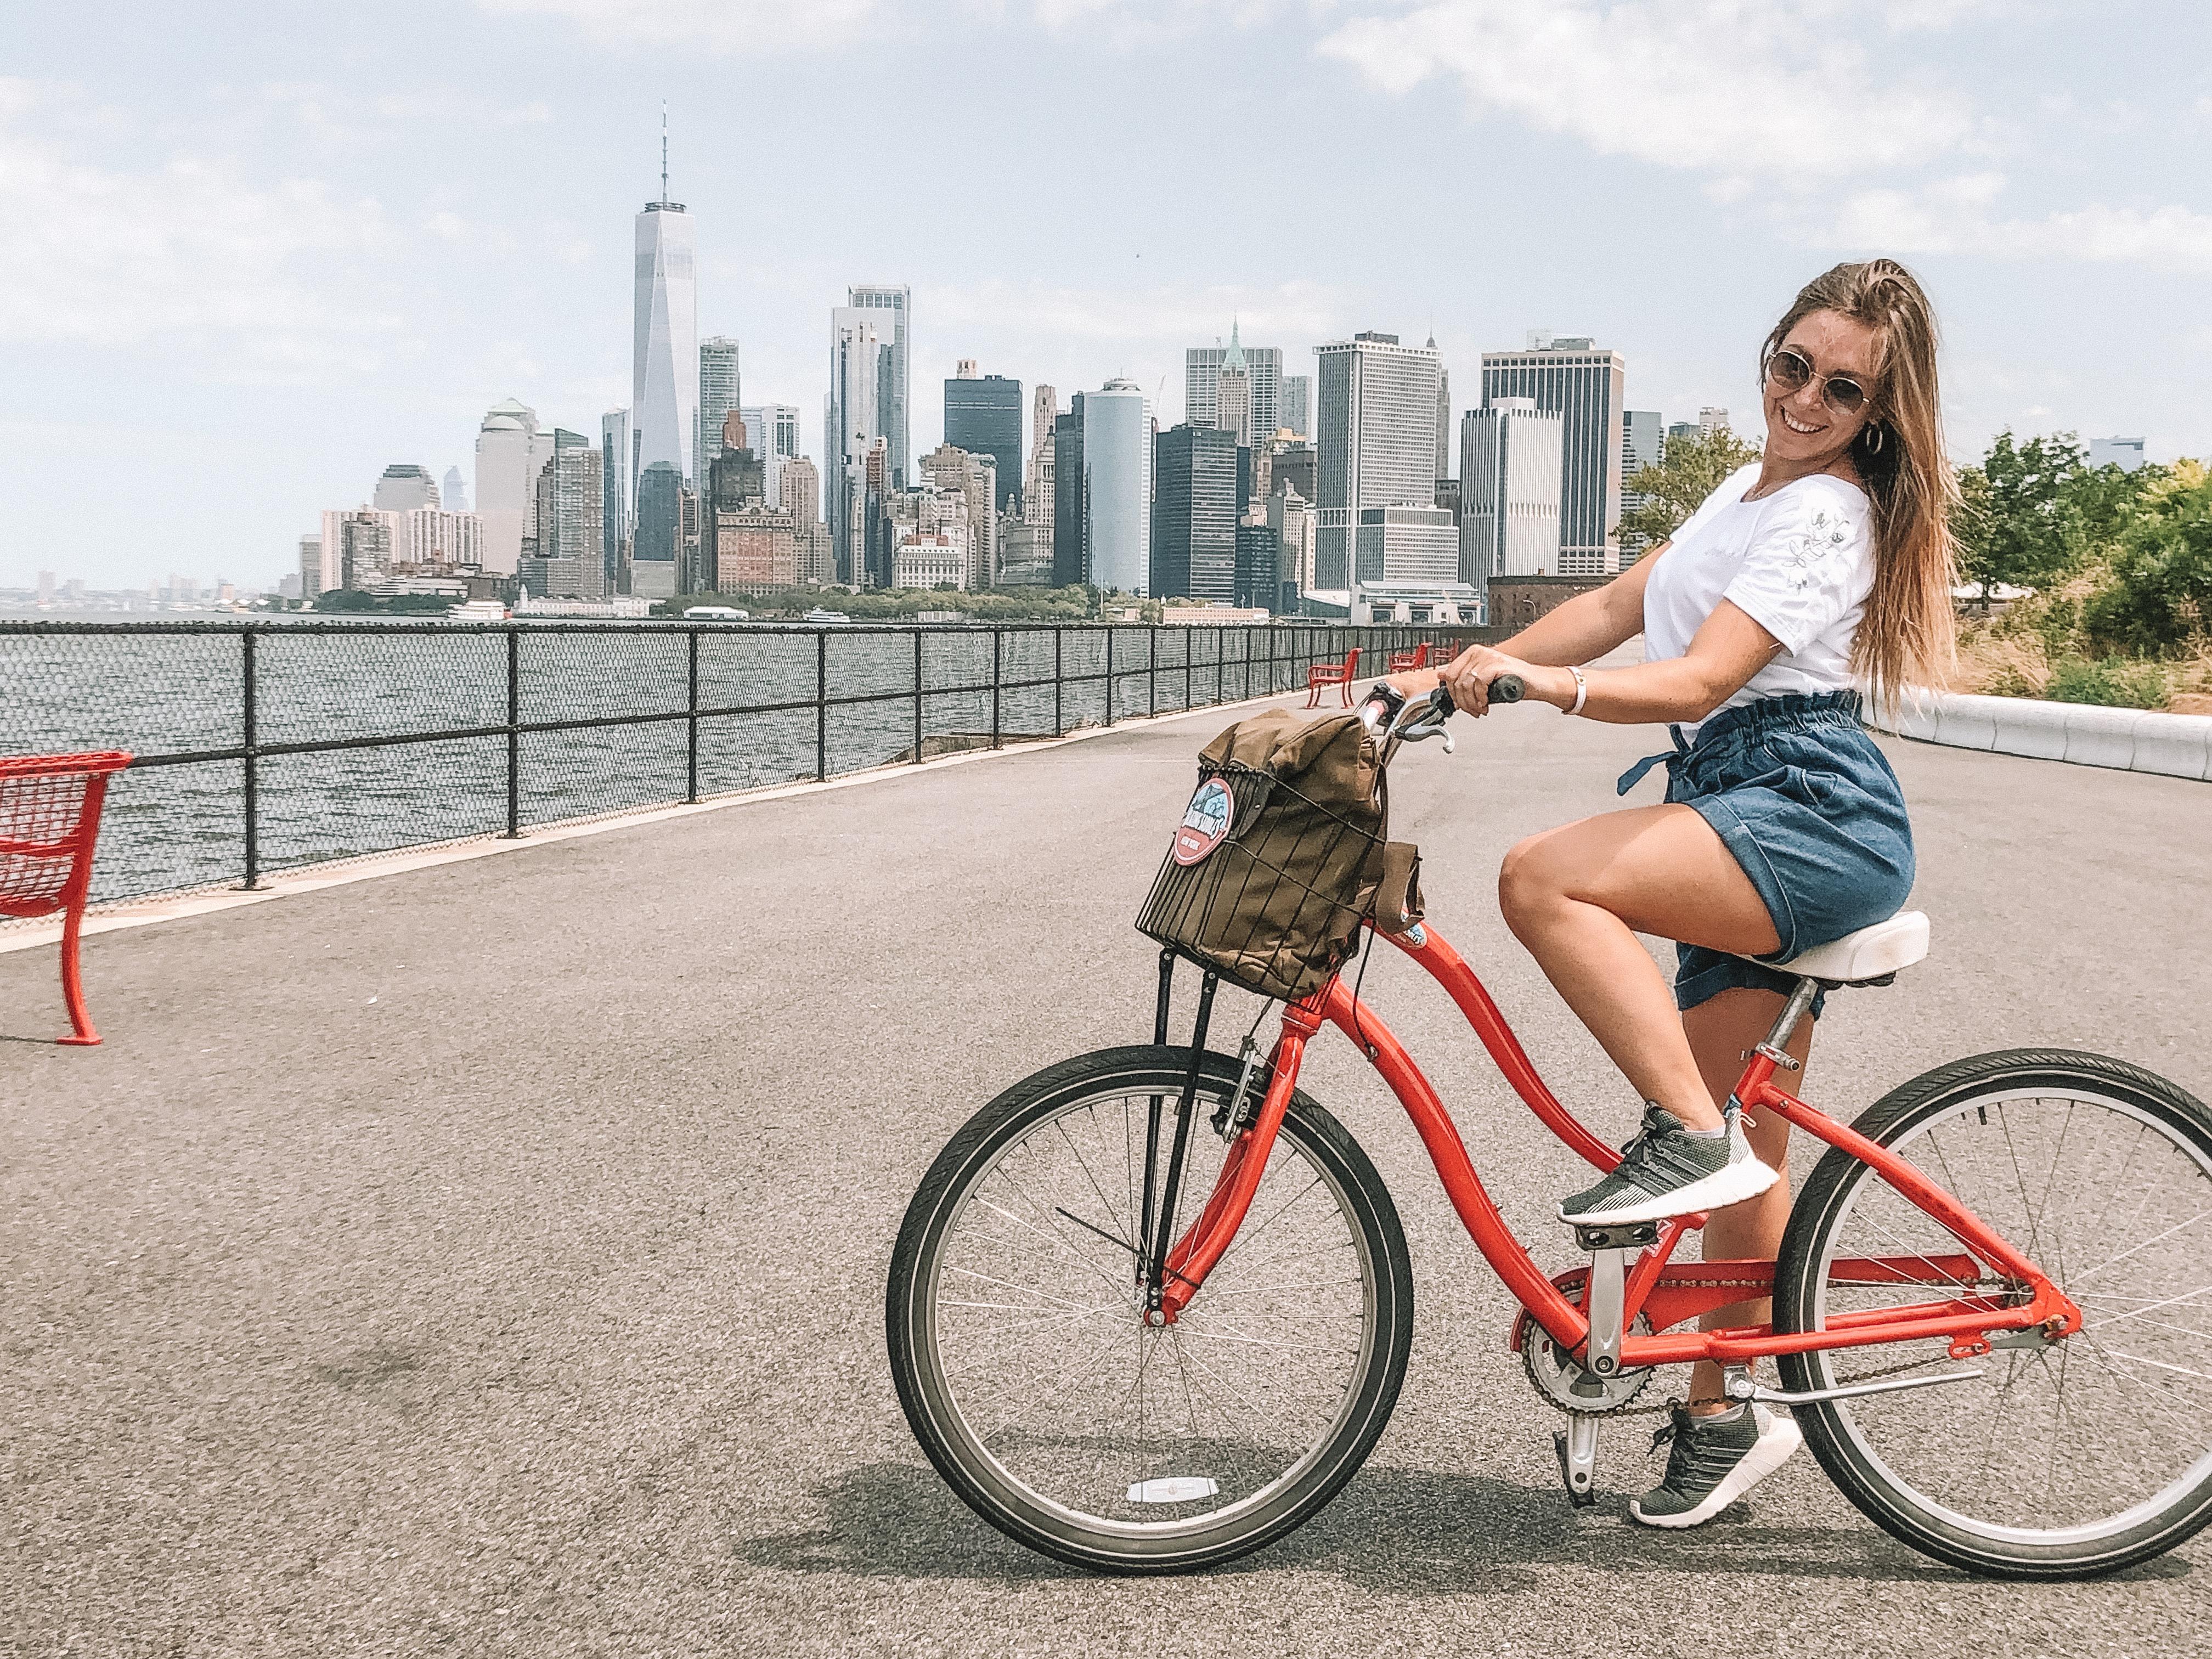 Skyline New York: Governors Island